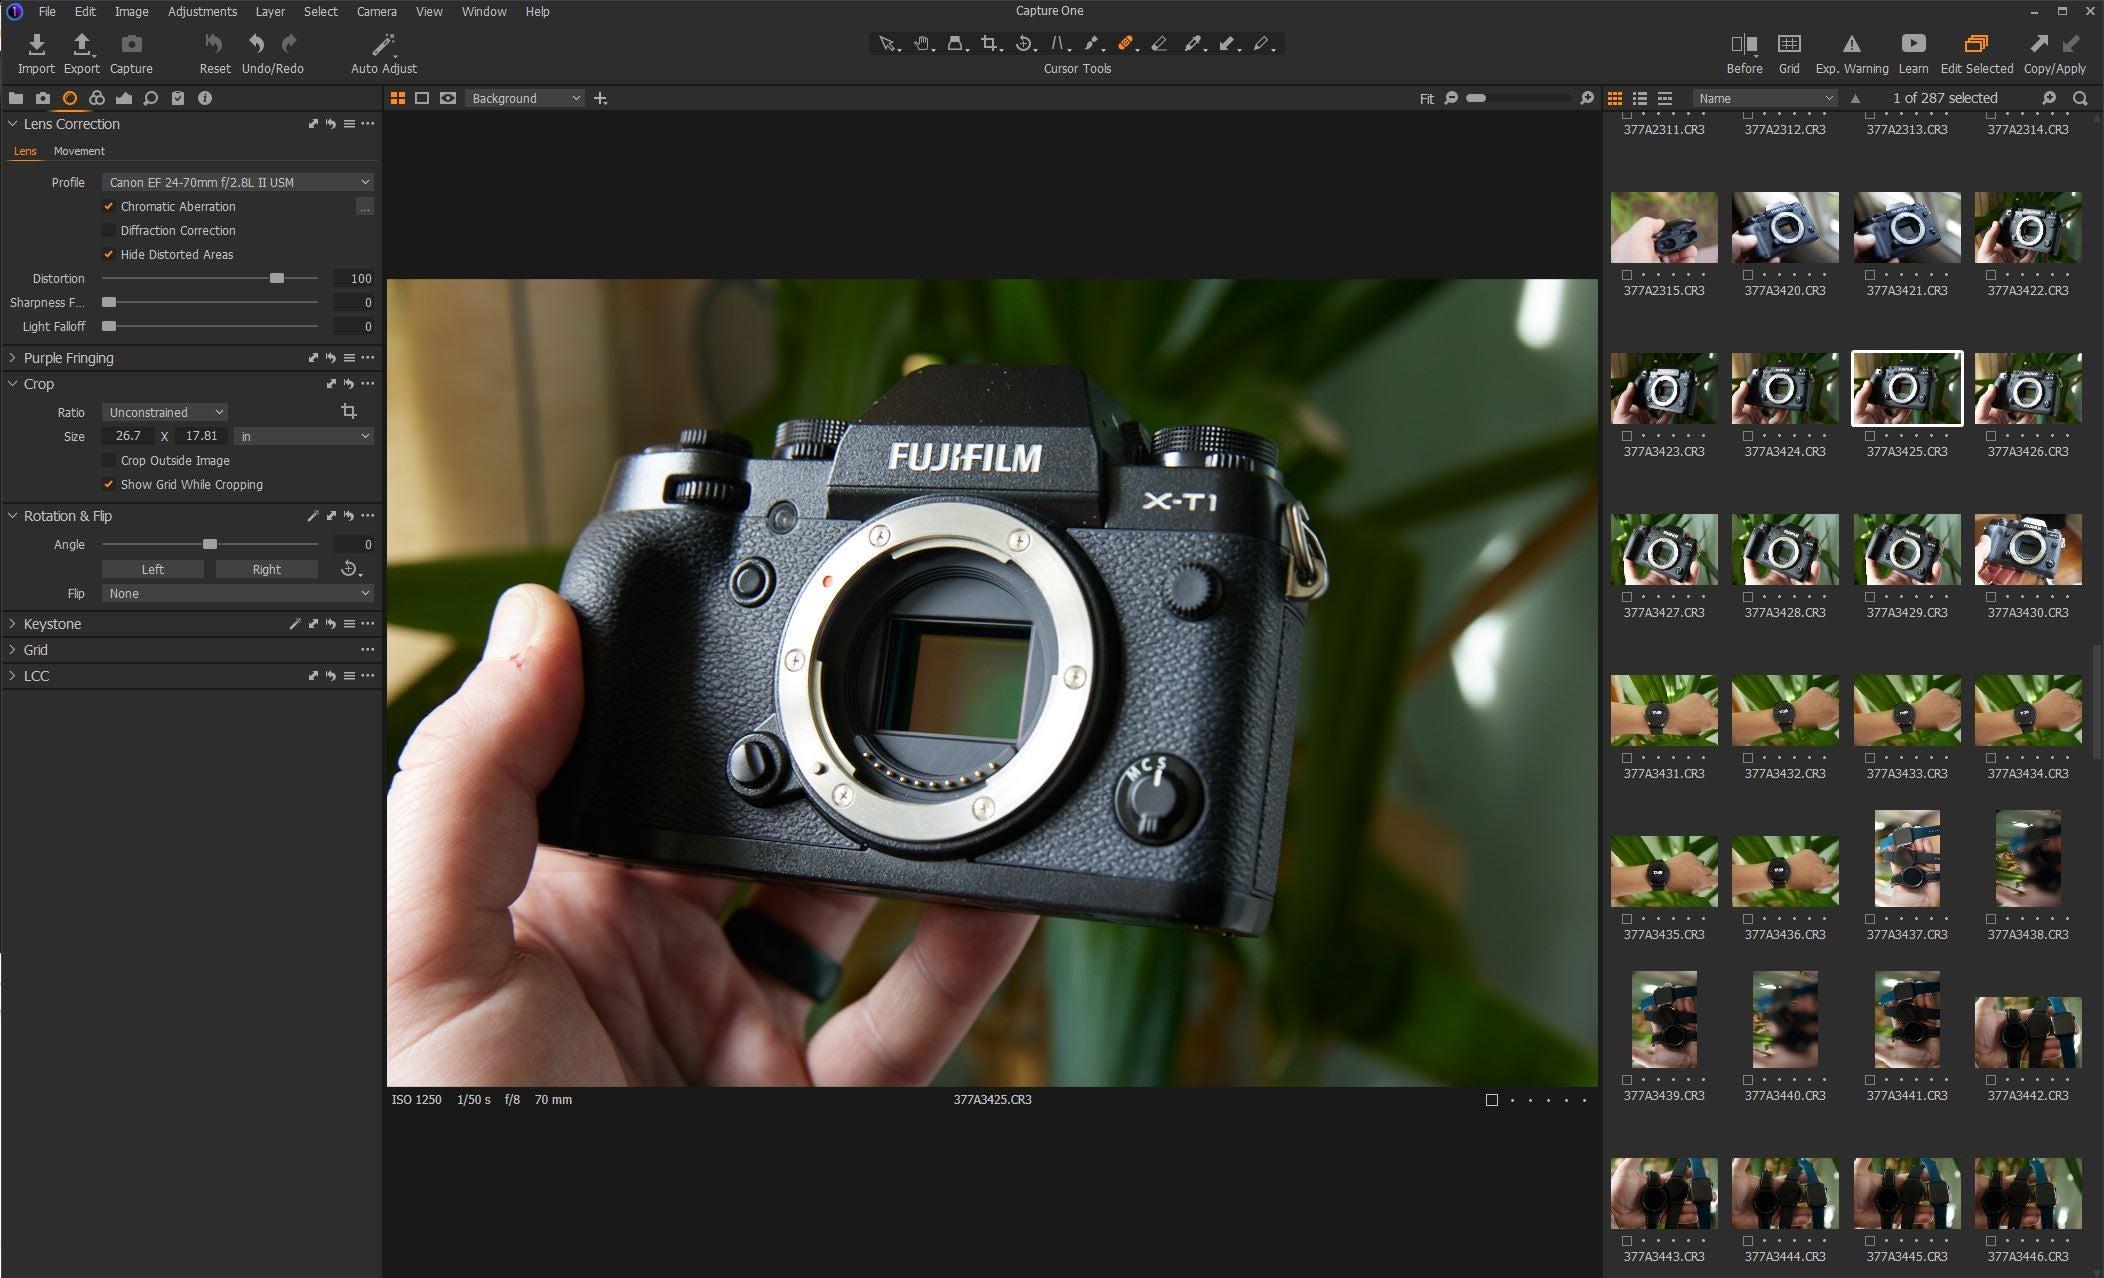 Capture One Pro camera details